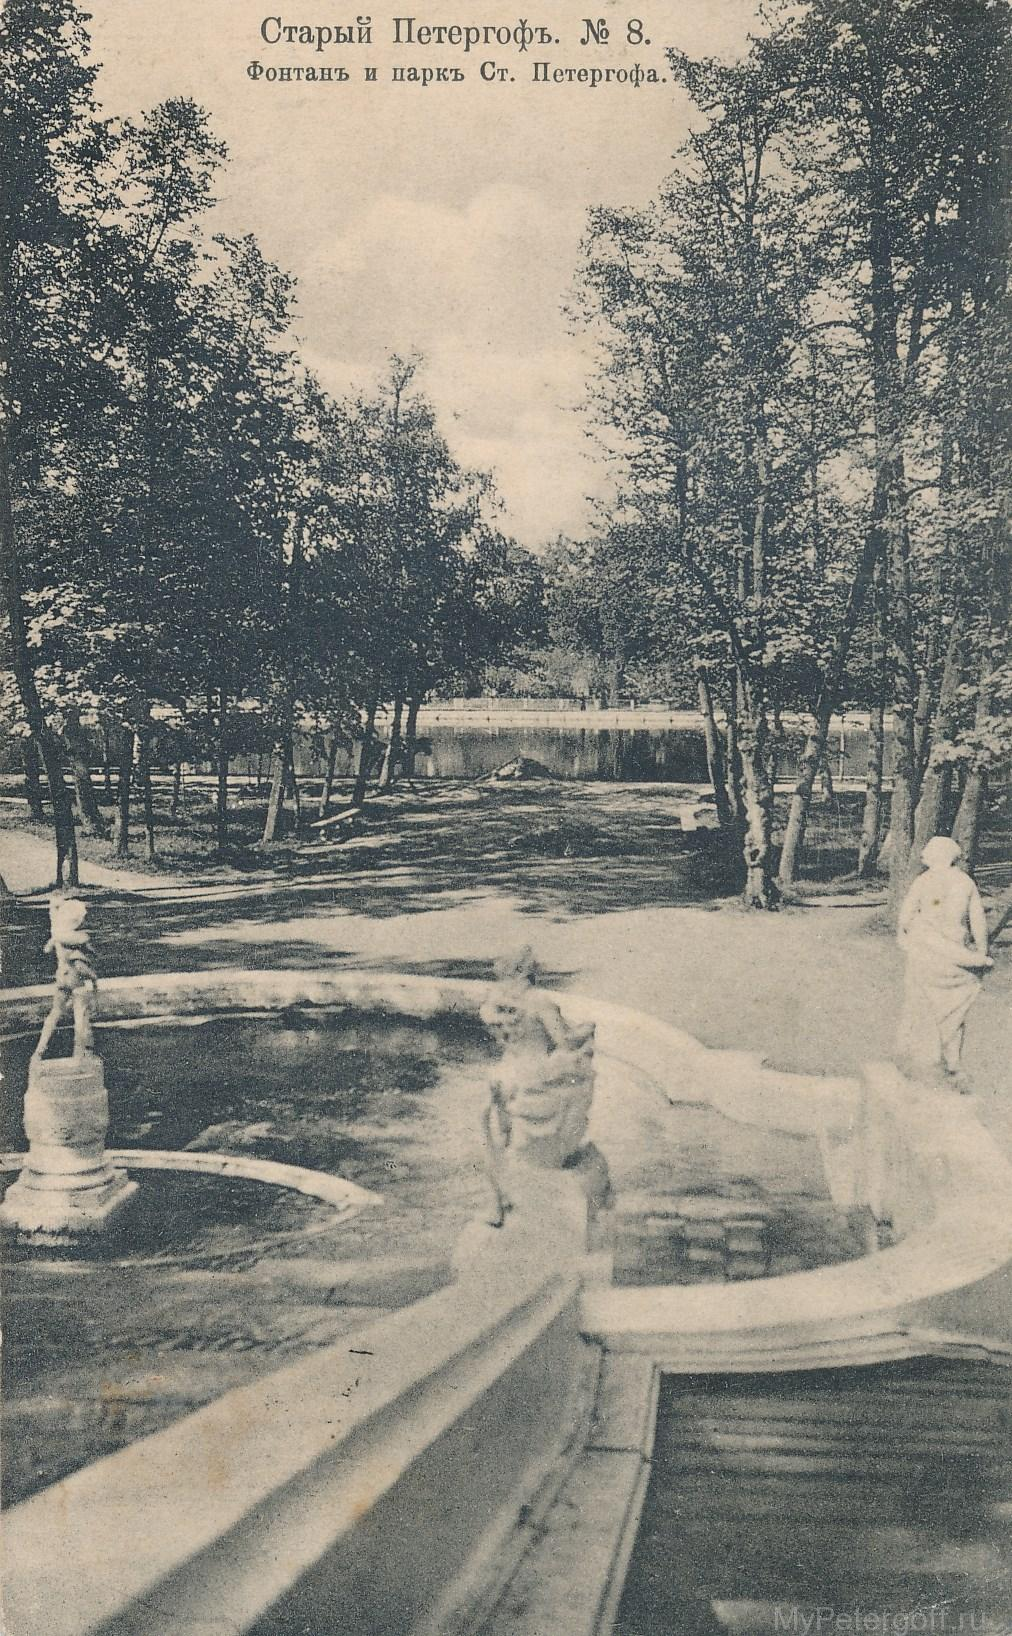 Фонтан и парк